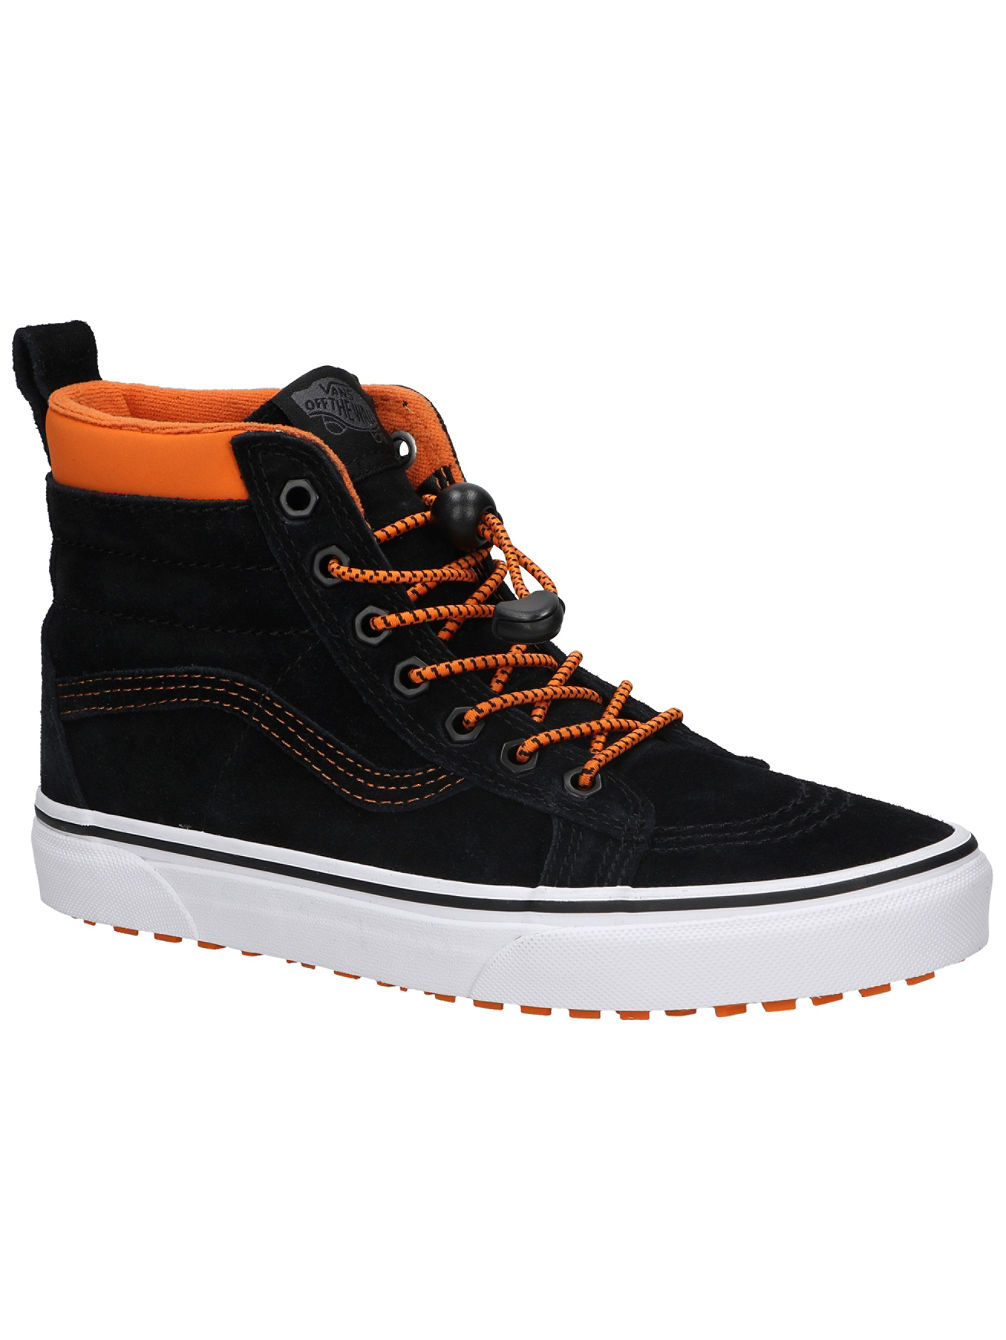 f313a034bd Buy Vans MTE Sk8-Hi Sneakers online at Blue Tomato